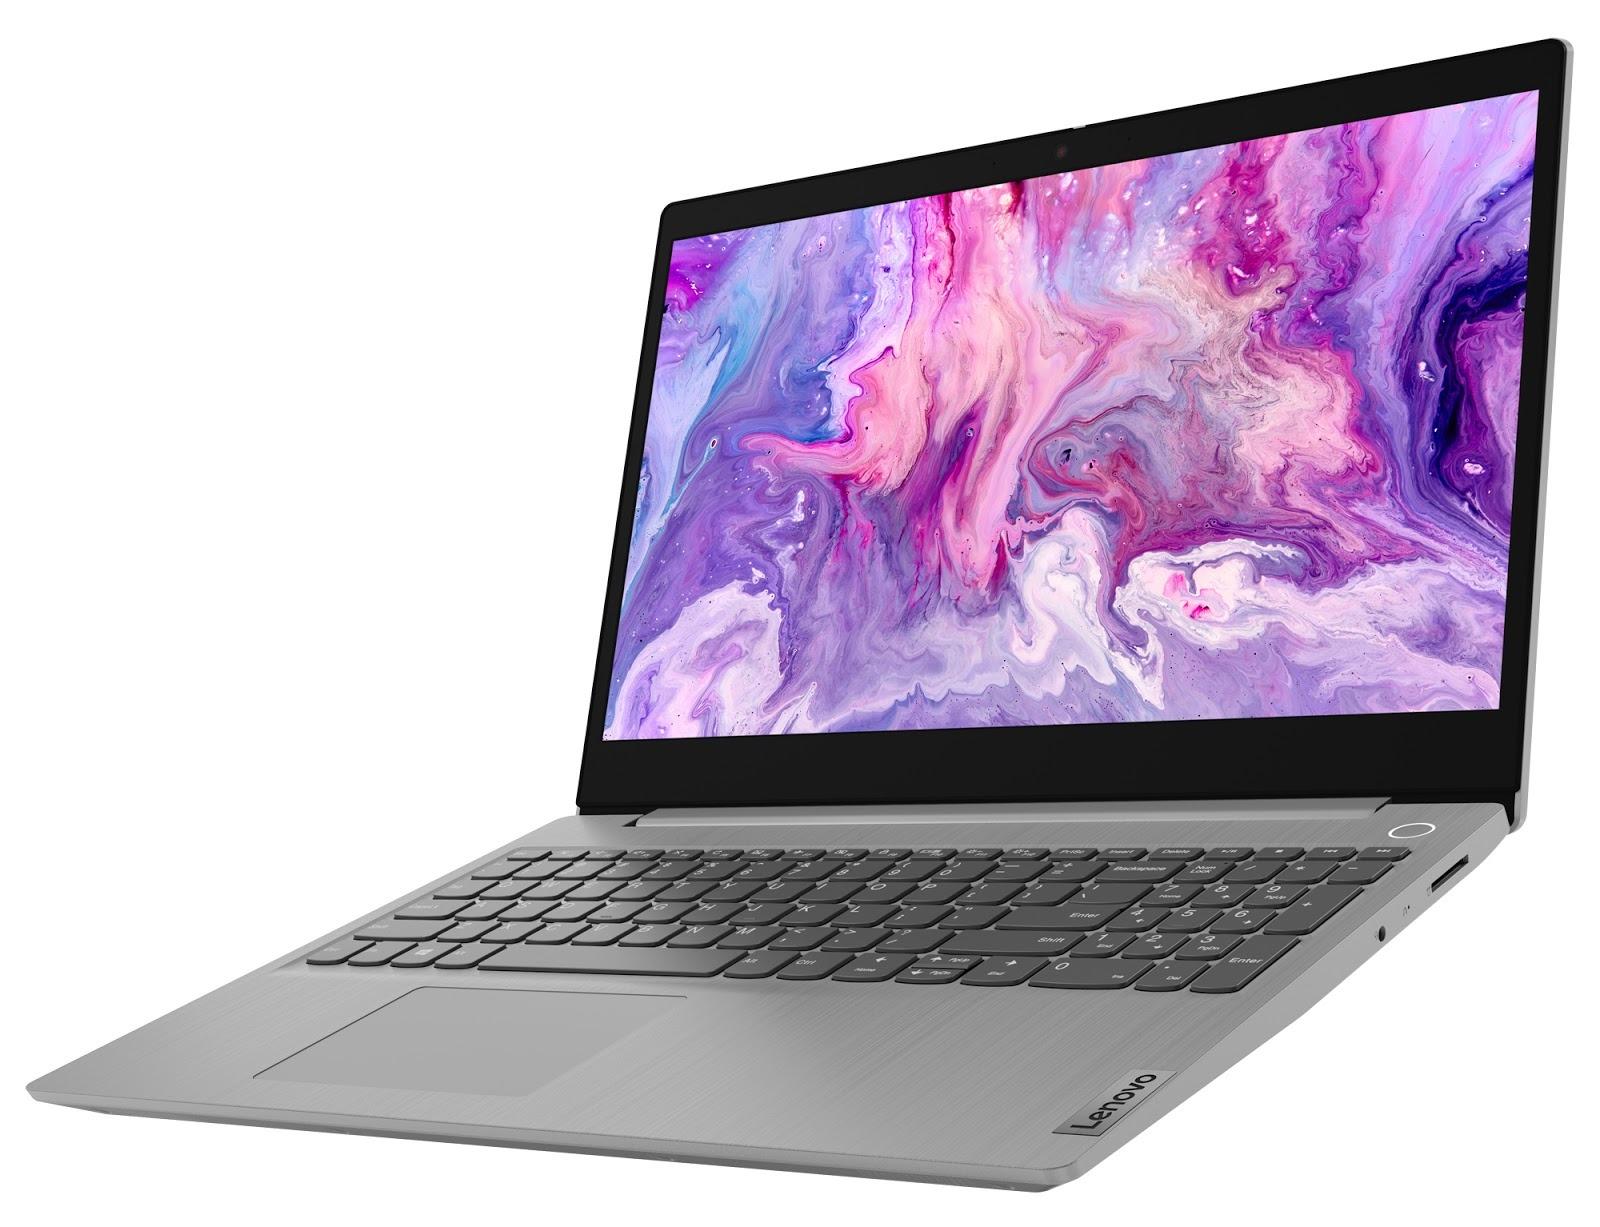 Фото 2. Ноутбук Lenovo ideapad 3 15ADA05 (81W100GWRE)